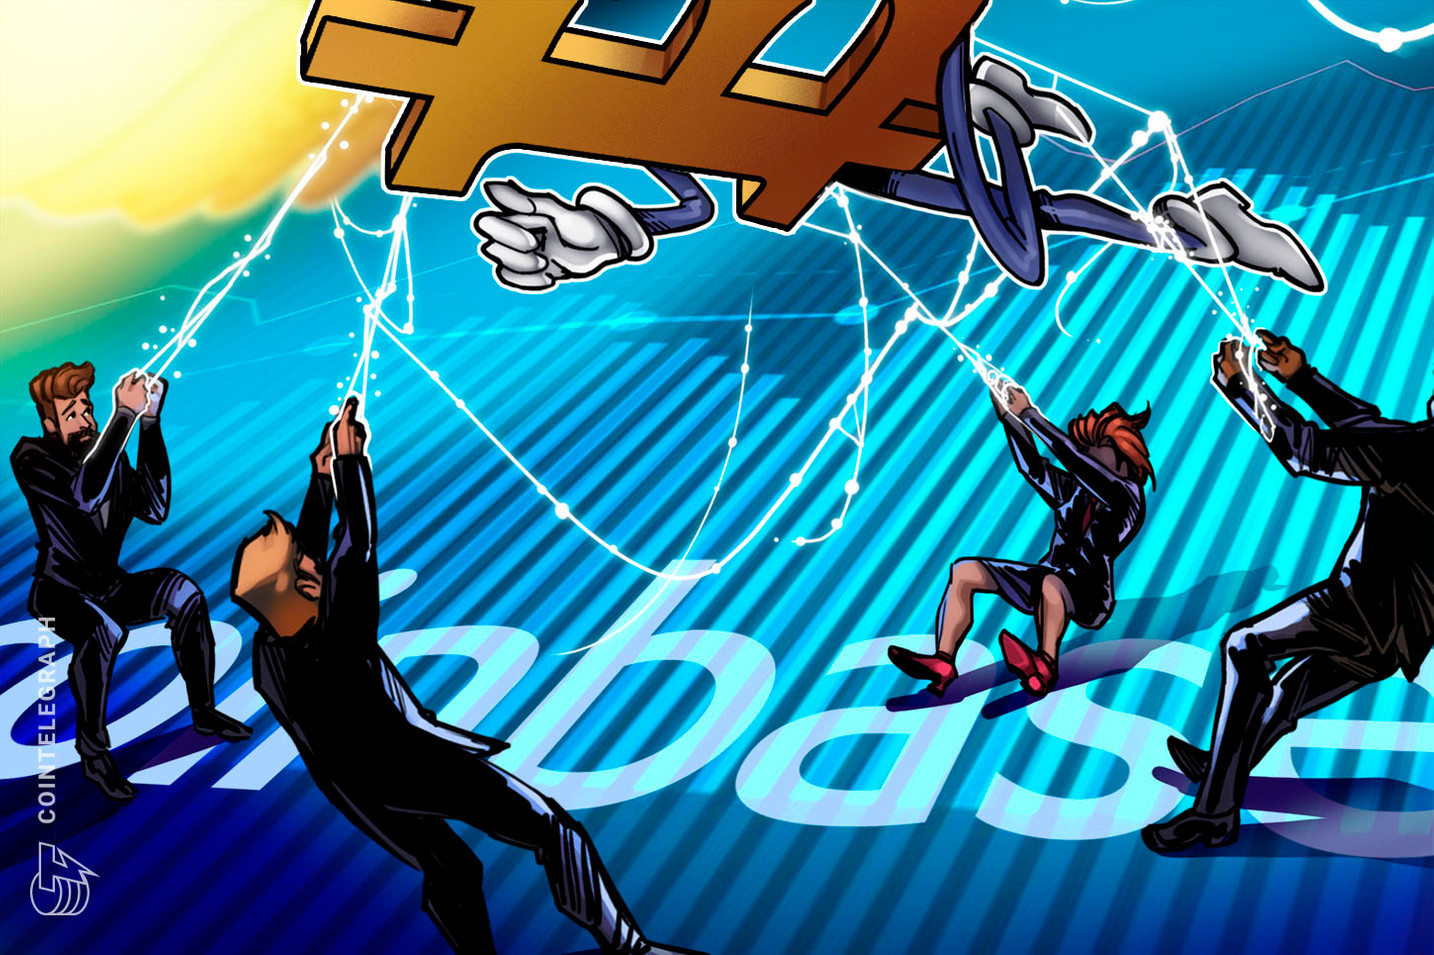 Coinbase has held Bitcoin on its balance sheets since 2012